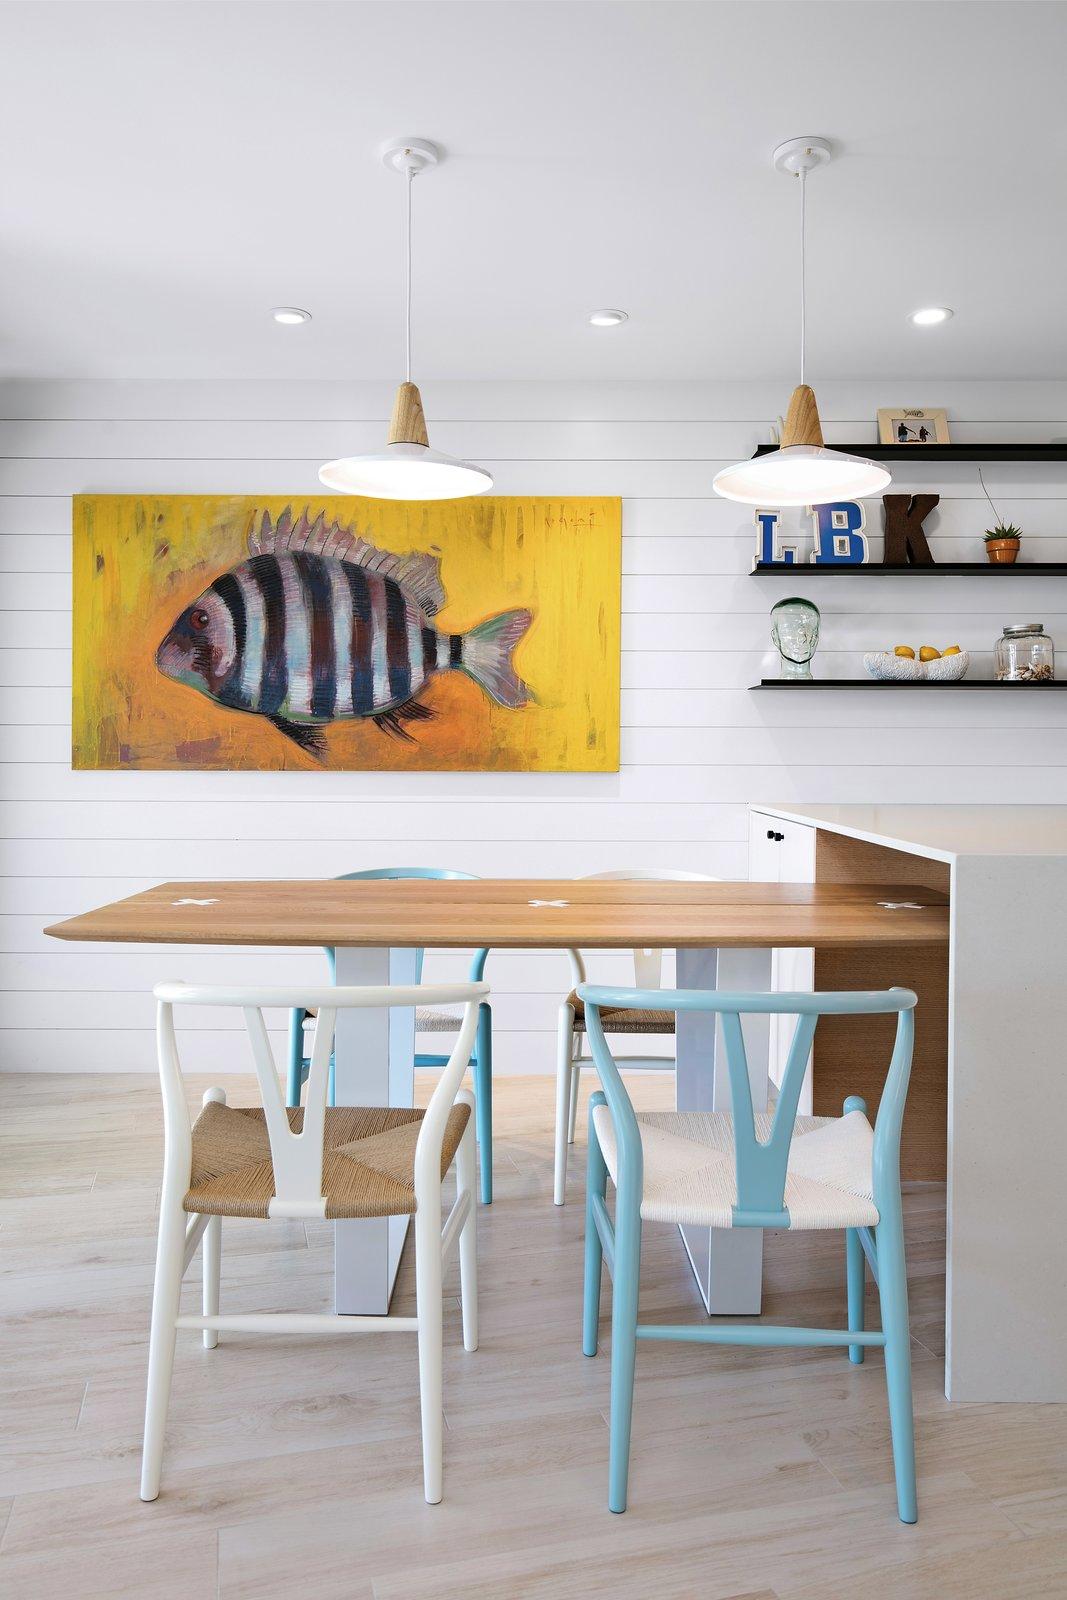 Dining Room, Accent Lighting, Pendant Lighting, Ceiling Lighting, Chair, Recessed Lighting, and Ceramic Tile Floor  Calypso Blue by Leader Design Studio